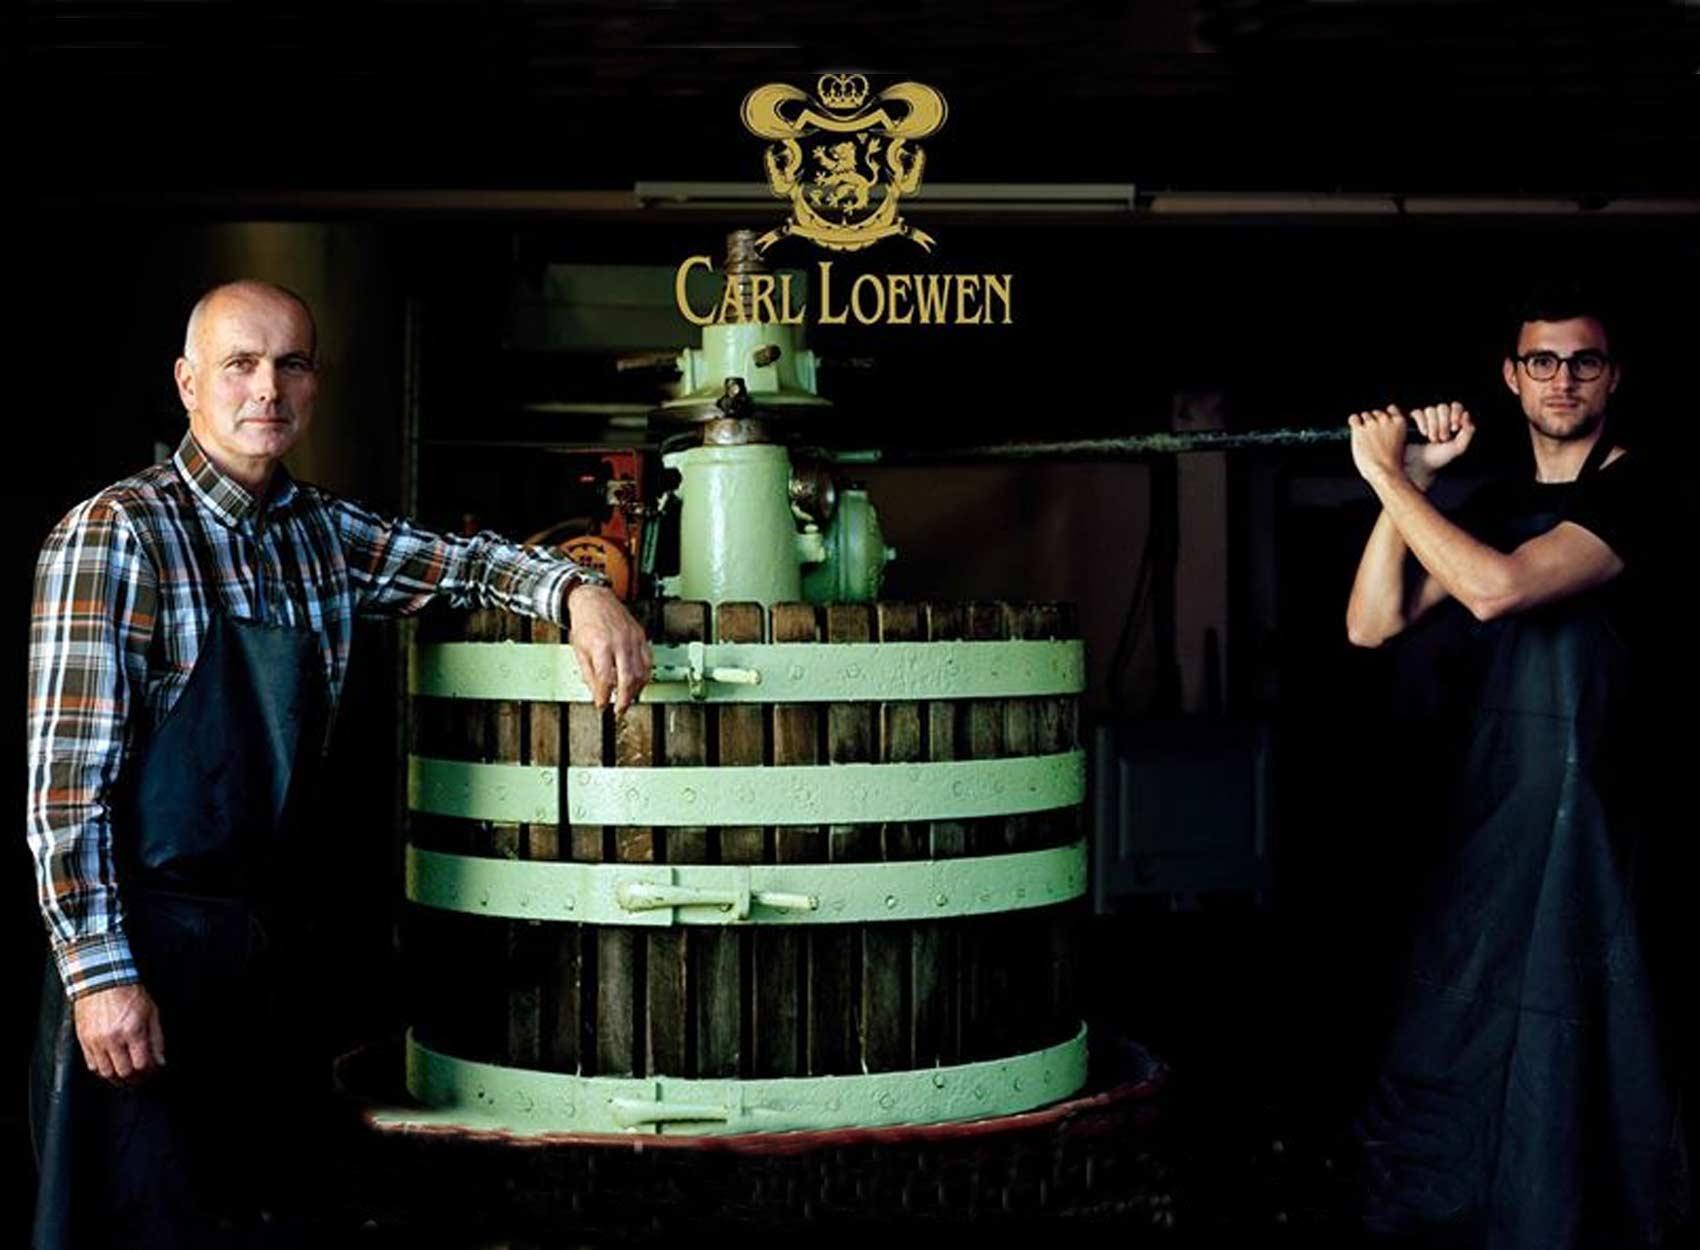 Weingut Carl Loewen